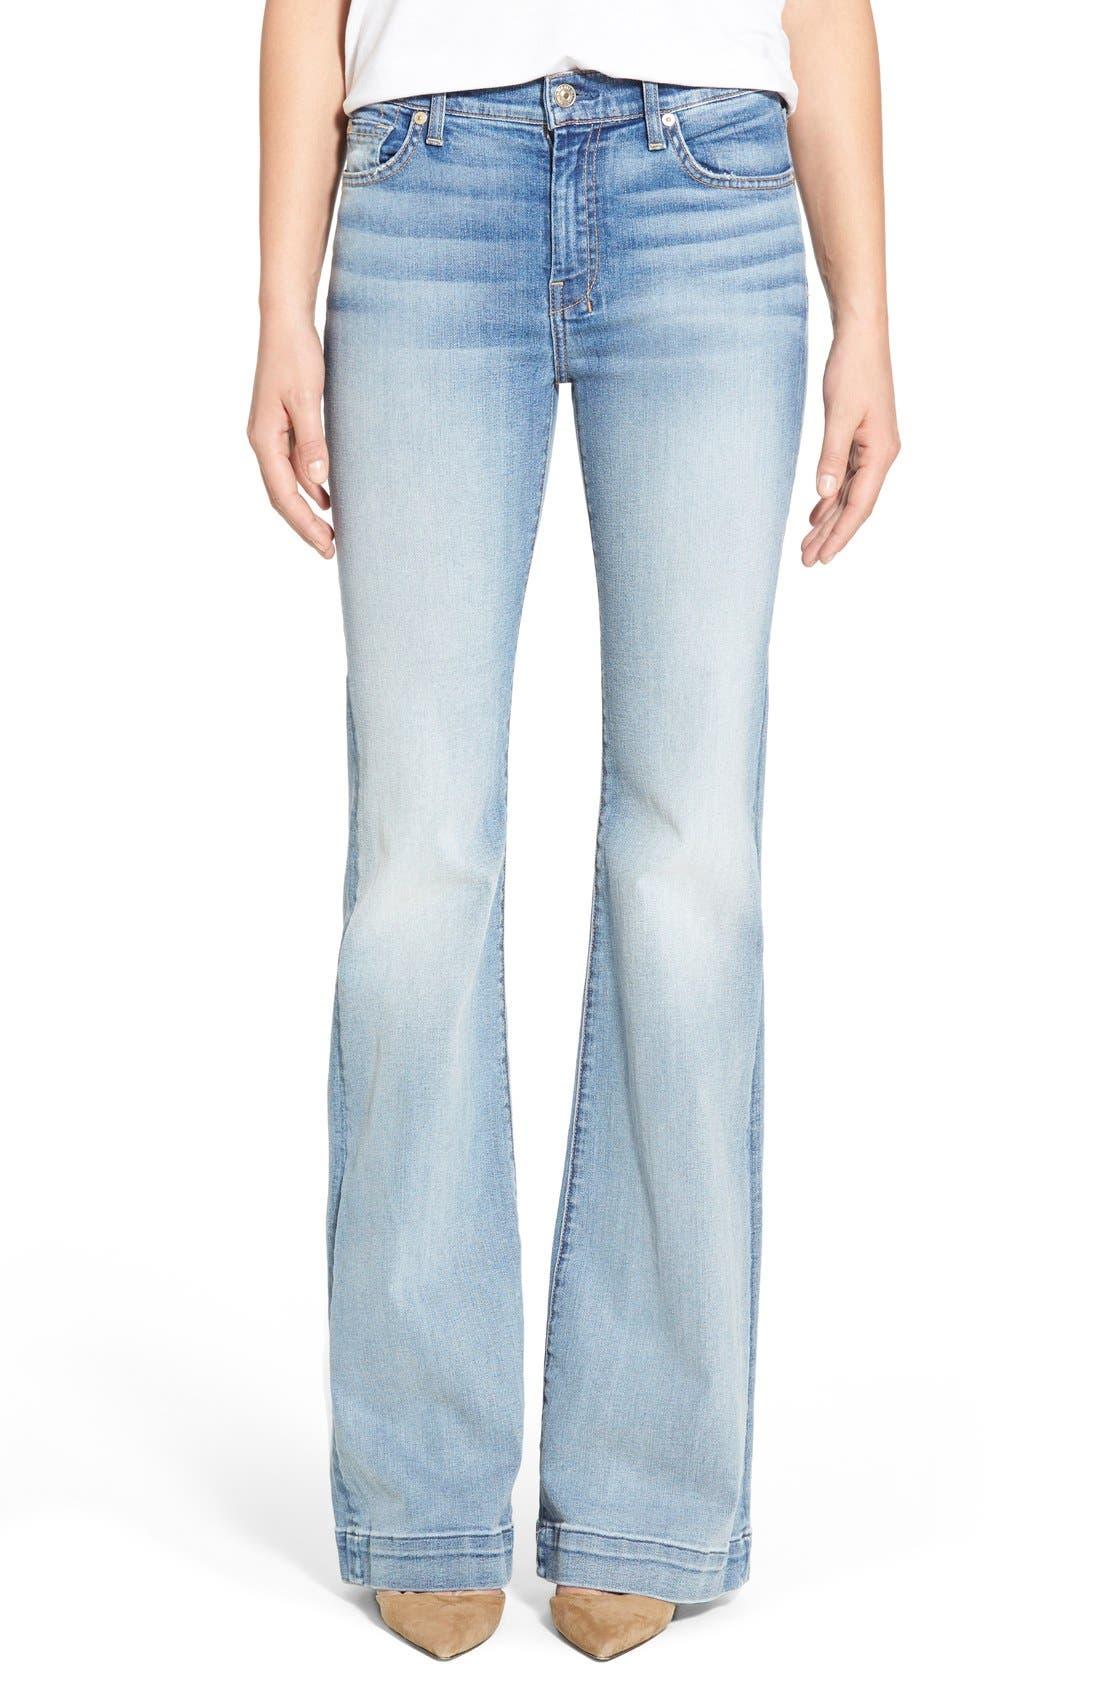 Alternate Image 1 Selected - 7 For All Mankind® 'Dojo' Wide Leg Jeans